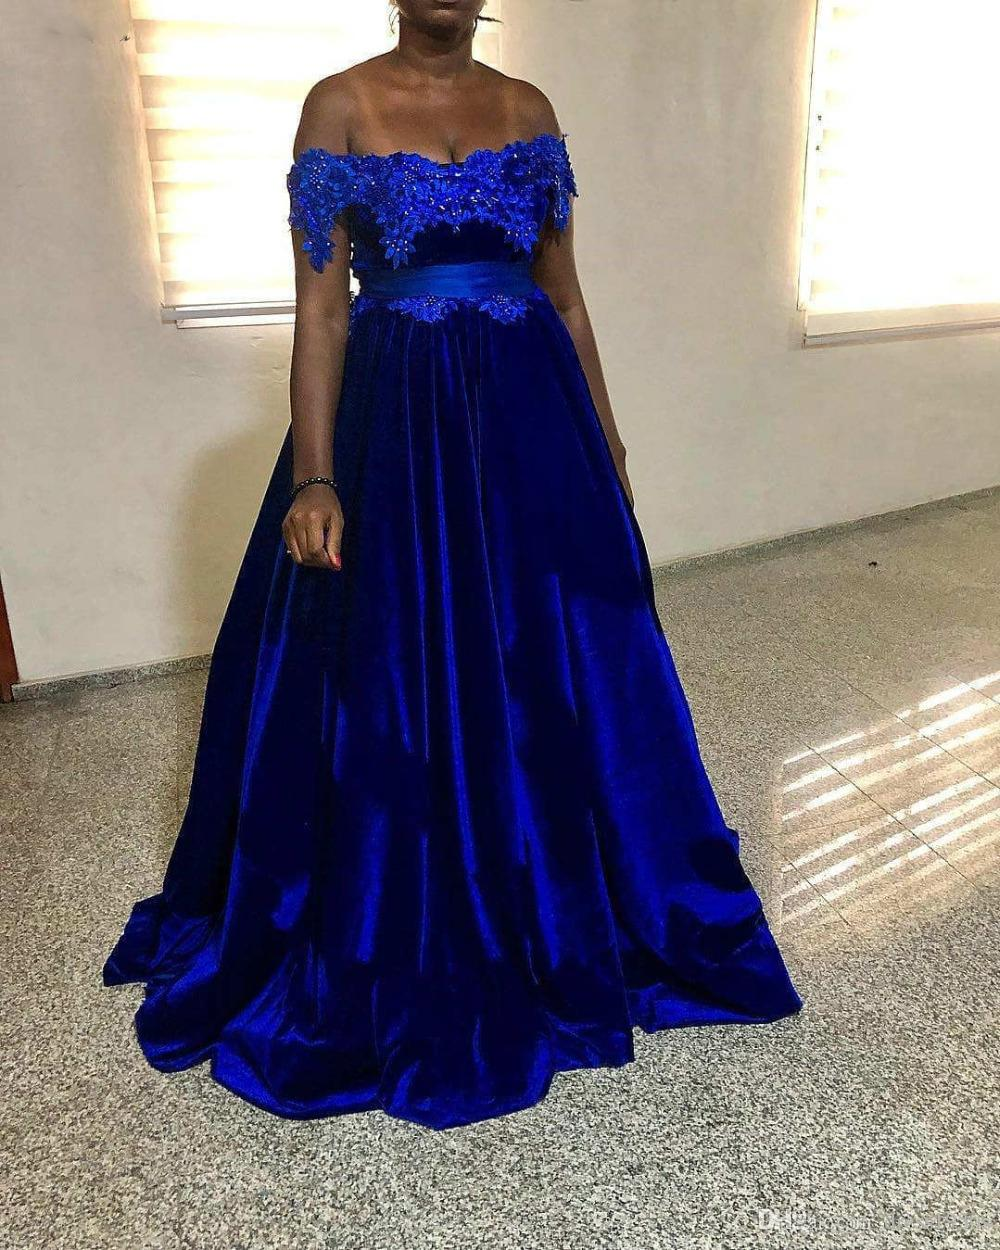 Abiti Da Sera On Line.Royal Blue Velvet Prom Dresses Appliques Empire A Line Floor